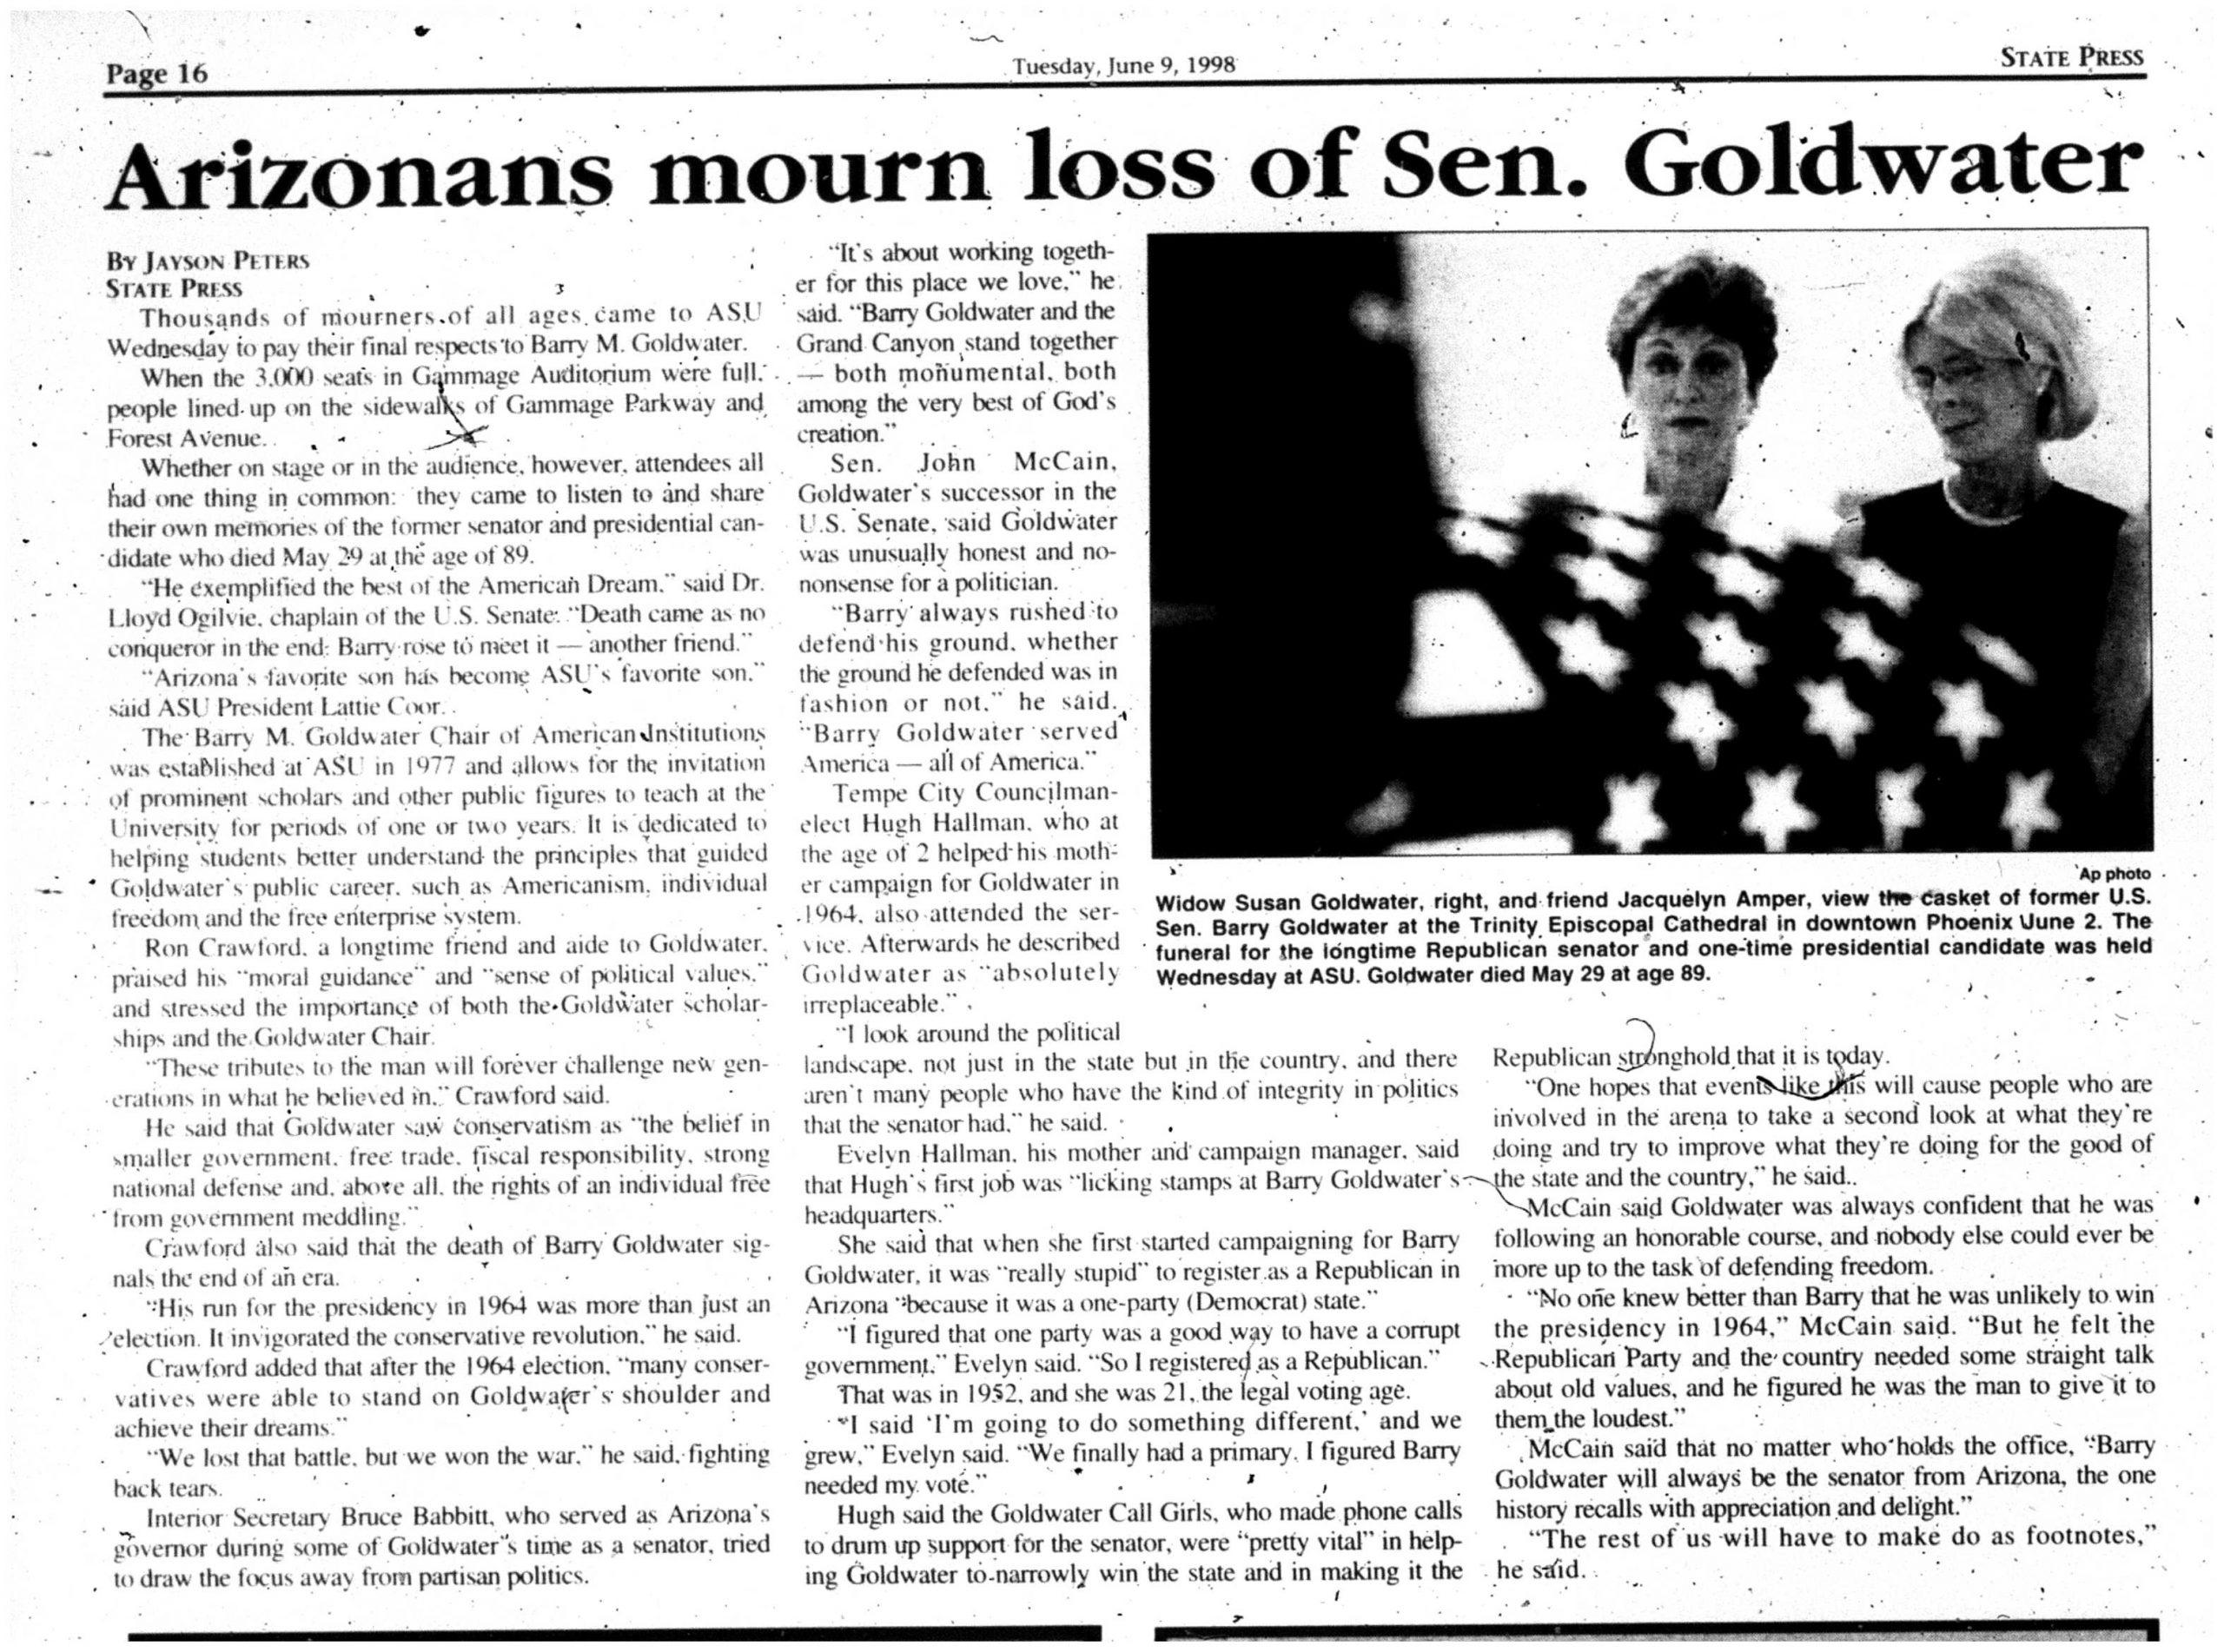 Arizonans mourn loss of Sen. Goldwater